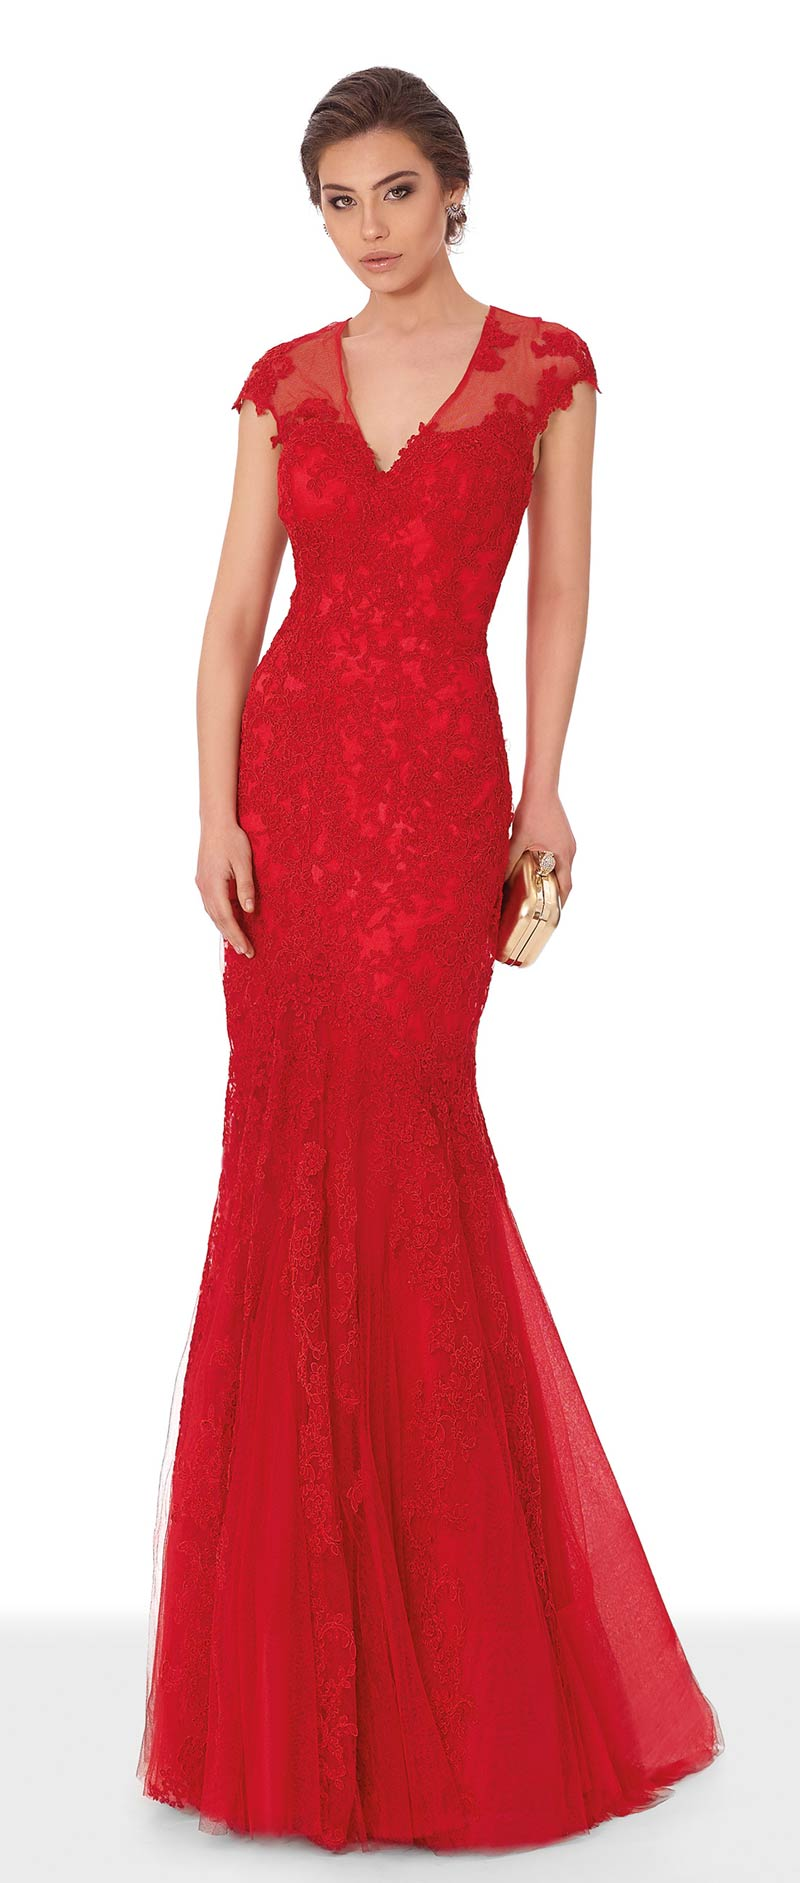 vestido rojo largo con escote a pico de corte sirena